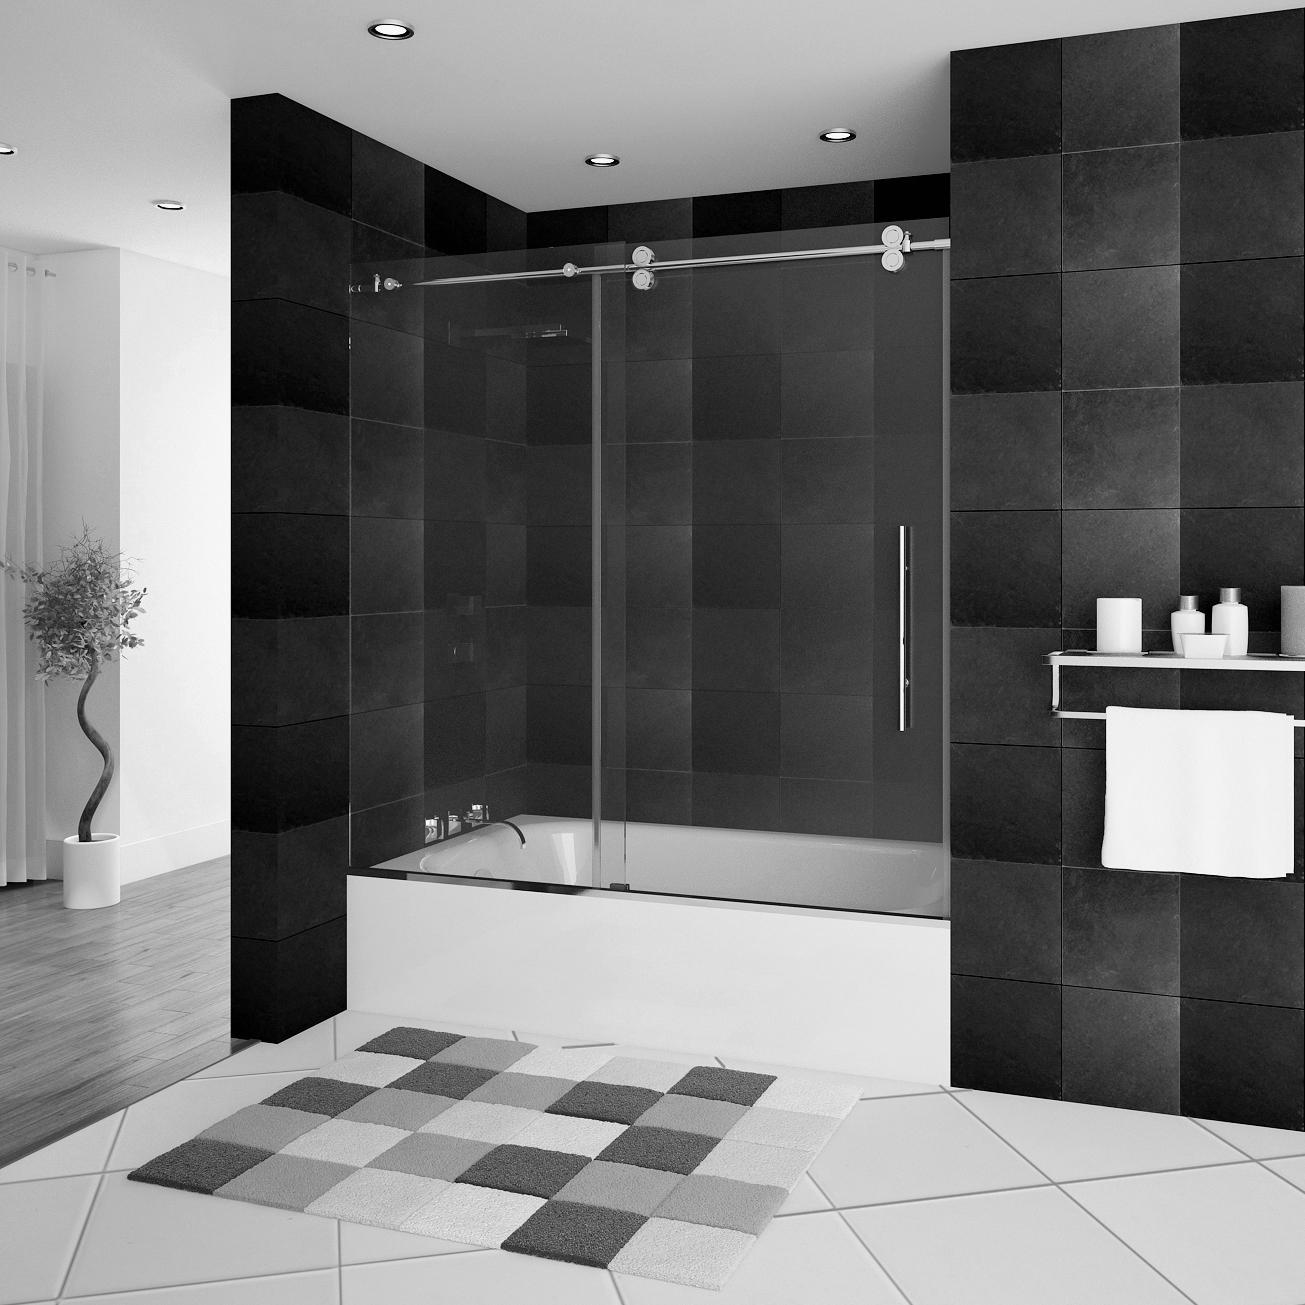 Bathtub Glass Enclosures - Learn More